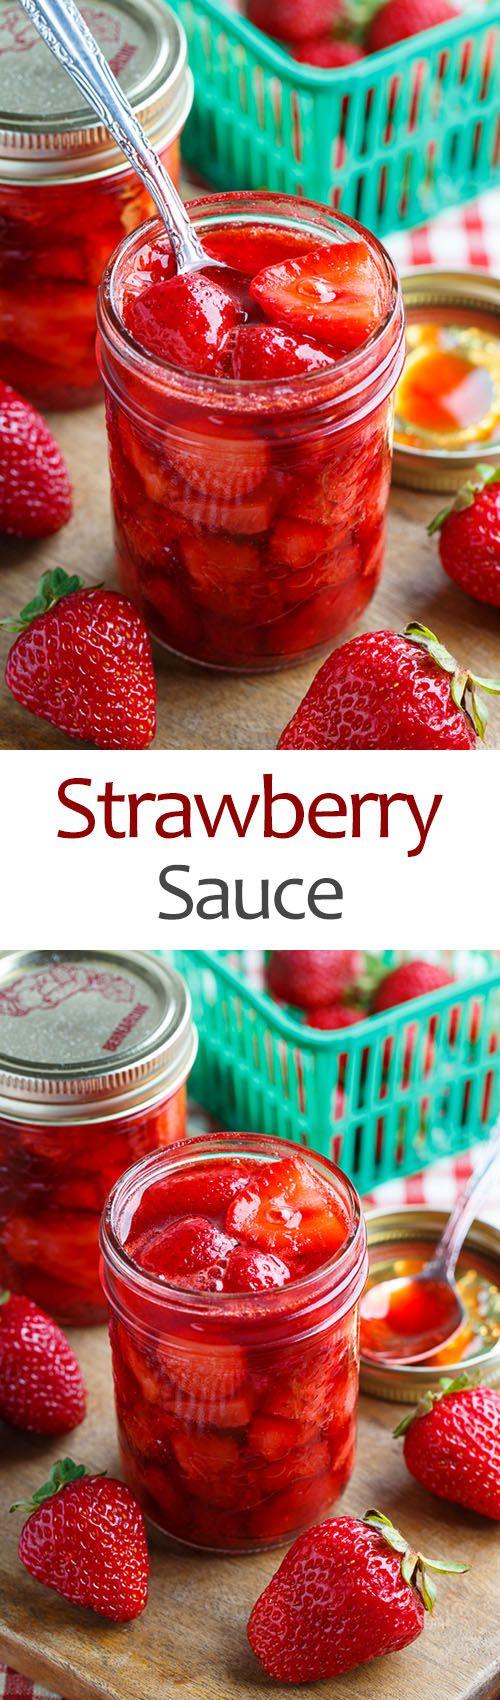 Strawberry Sauce ♥♥